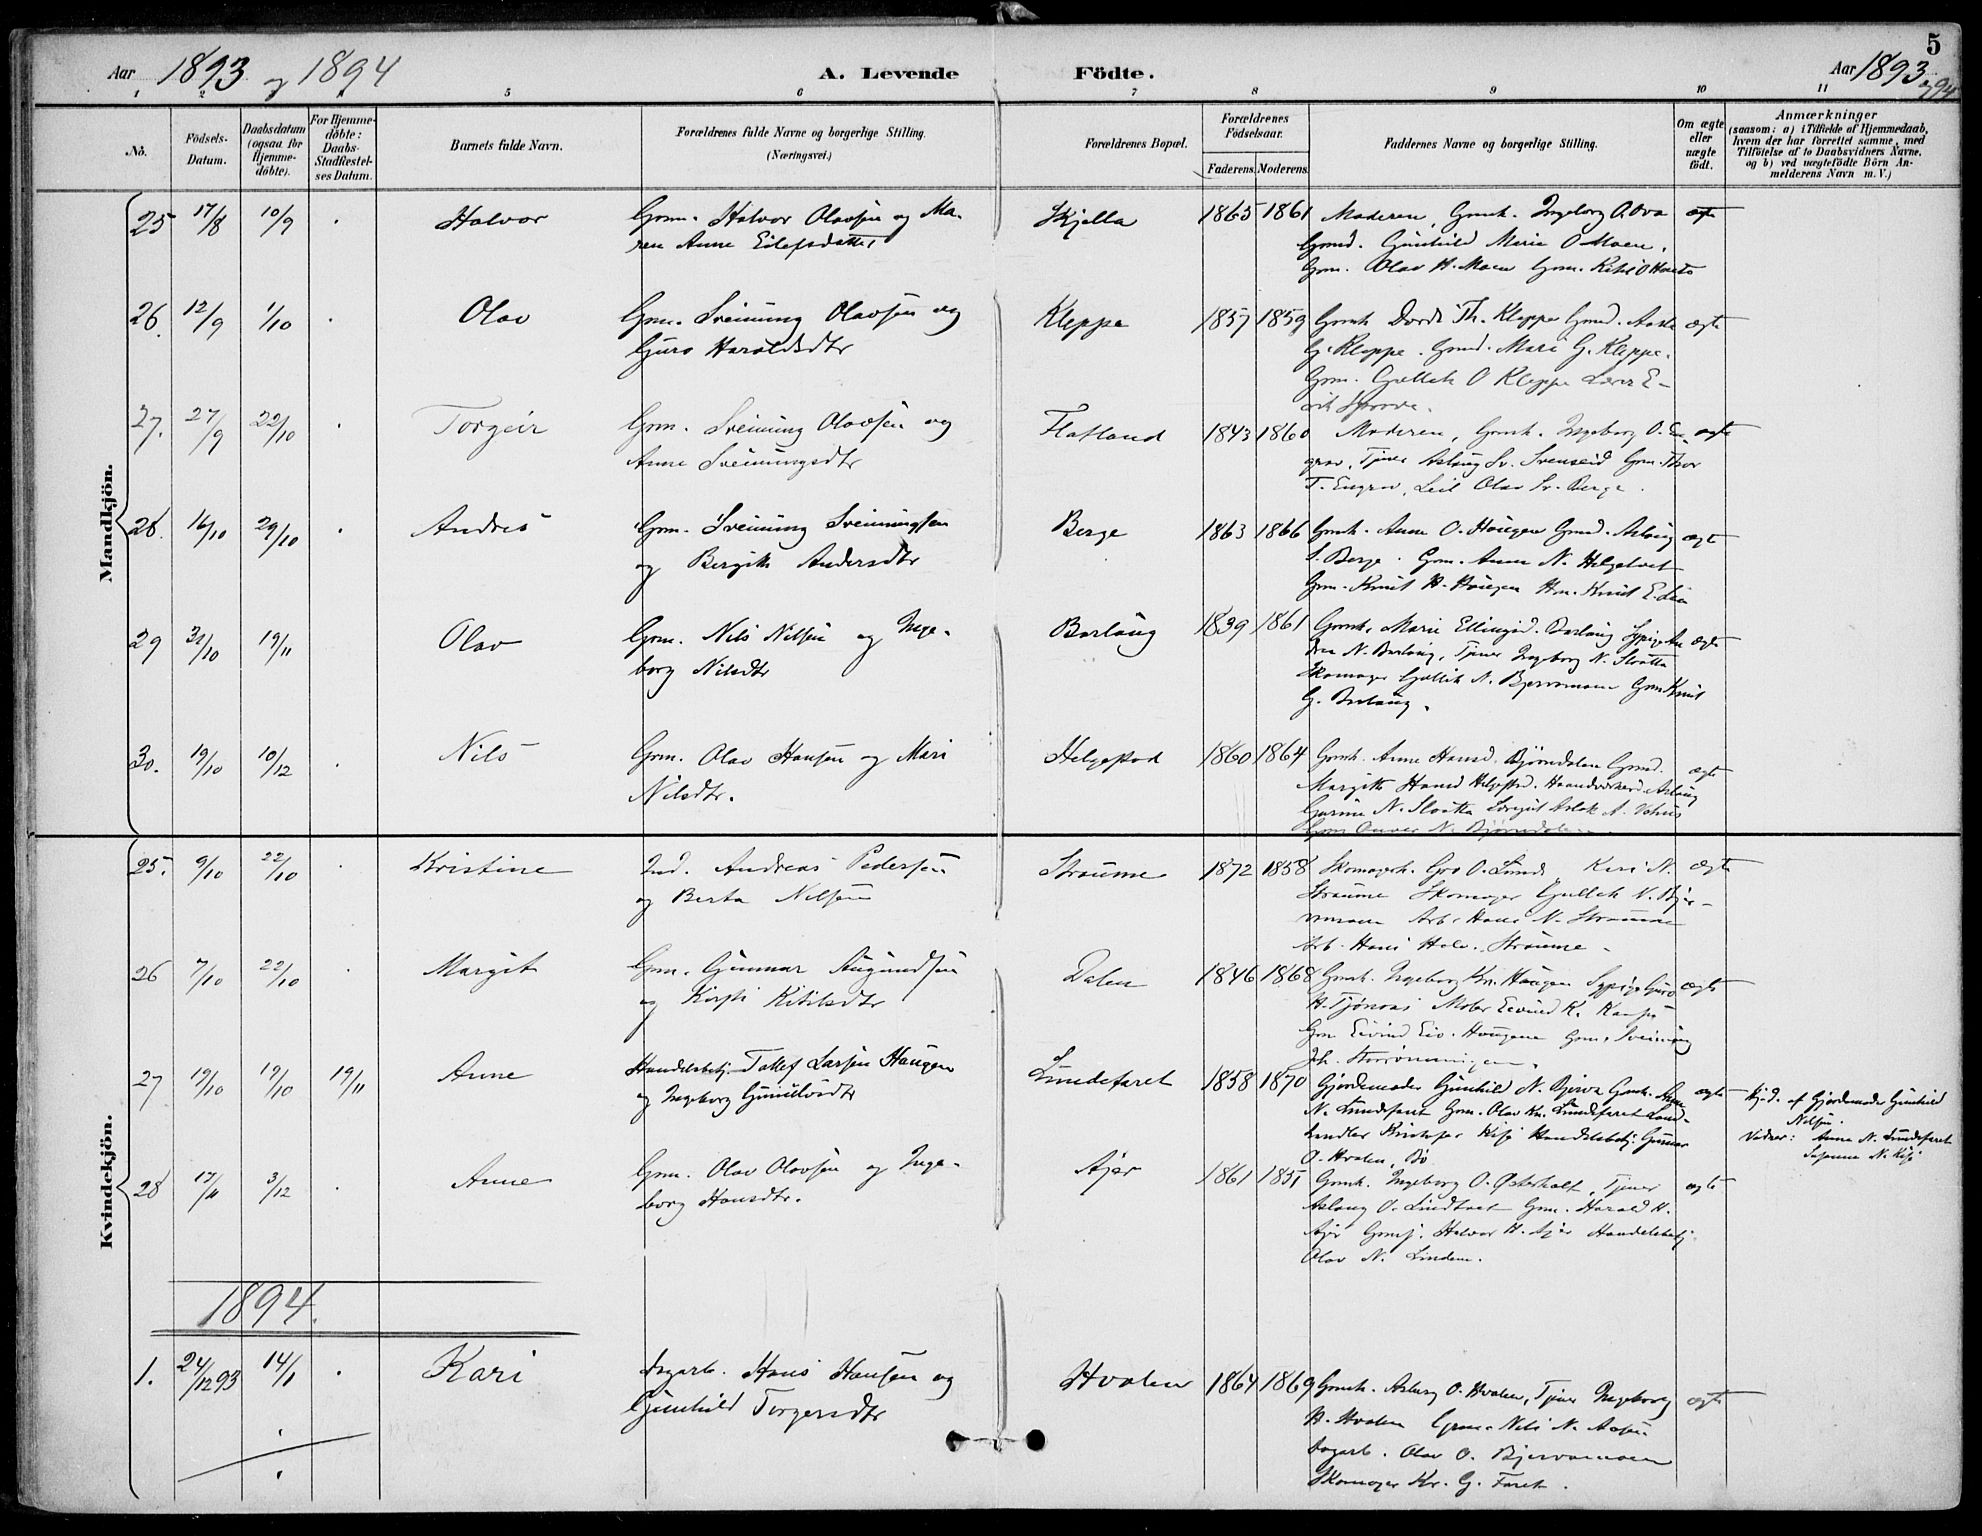 SAKO, Lunde kirkebøker, F/Fa/L0003: Ministerialbok nr. I 3, 1893-1902, s. 5